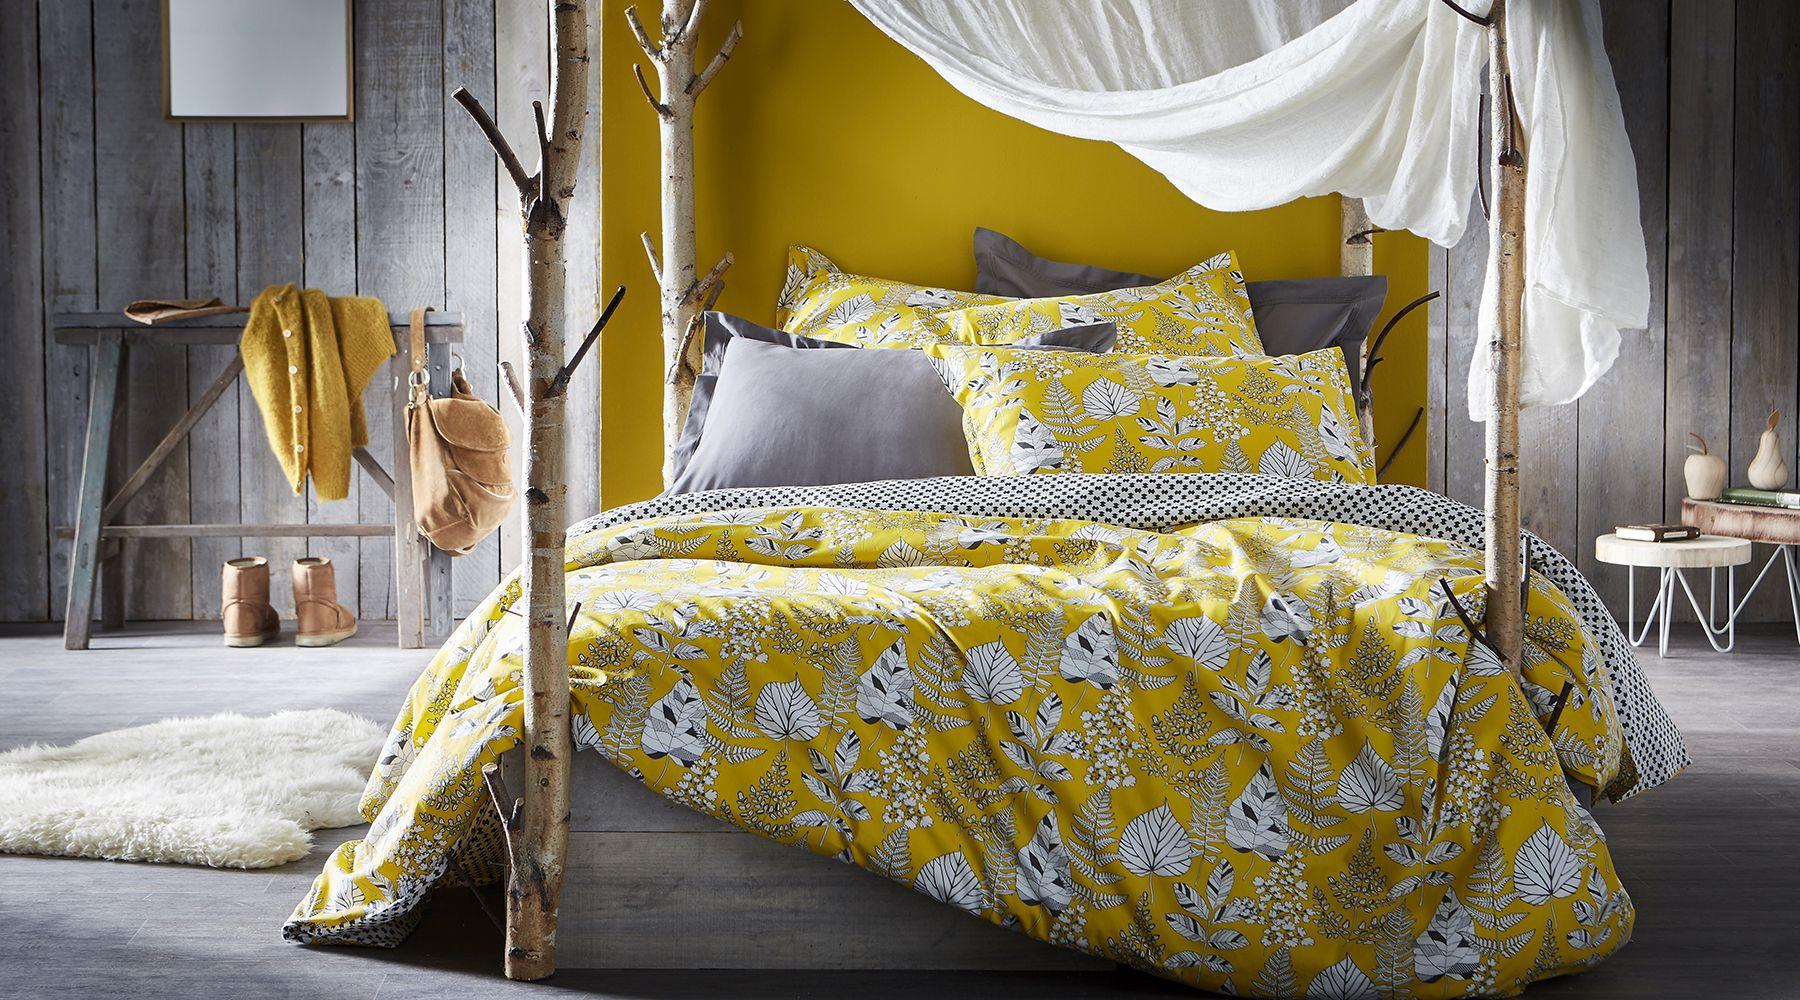 tendance chambre coucher into the woods zodio boh me chambre la chambre pinterest. Black Bedroom Furniture Sets. Home Design Ideas